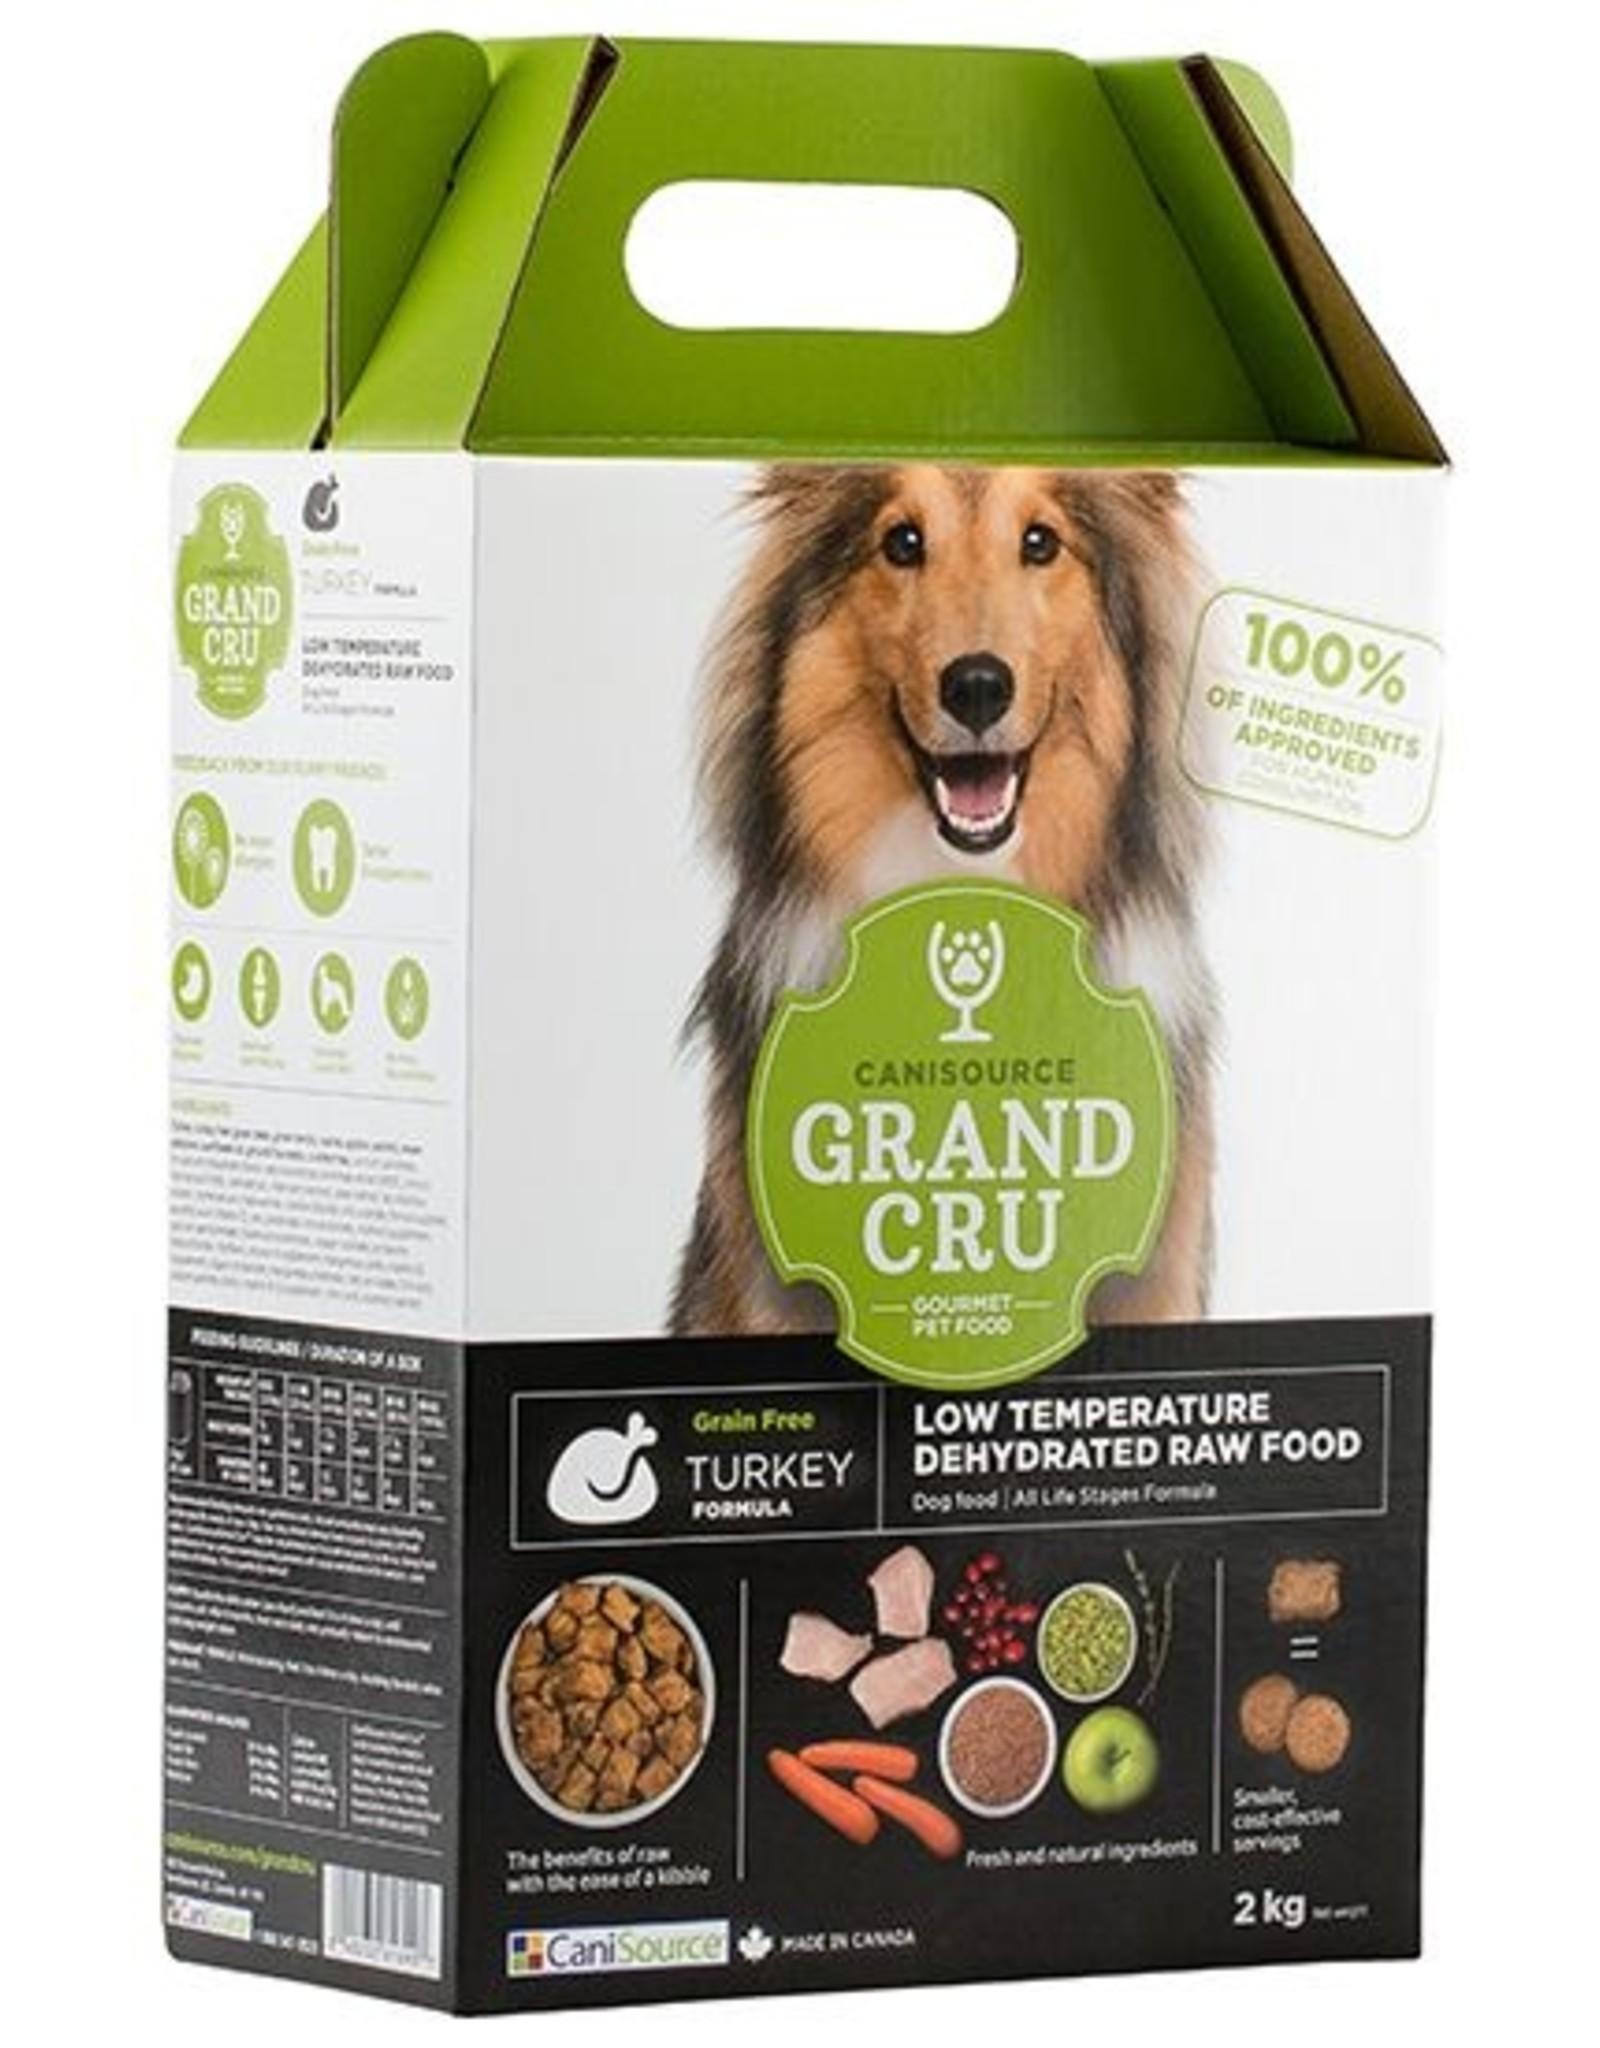 Canisource Canisource Grand Cru Dog Turkey